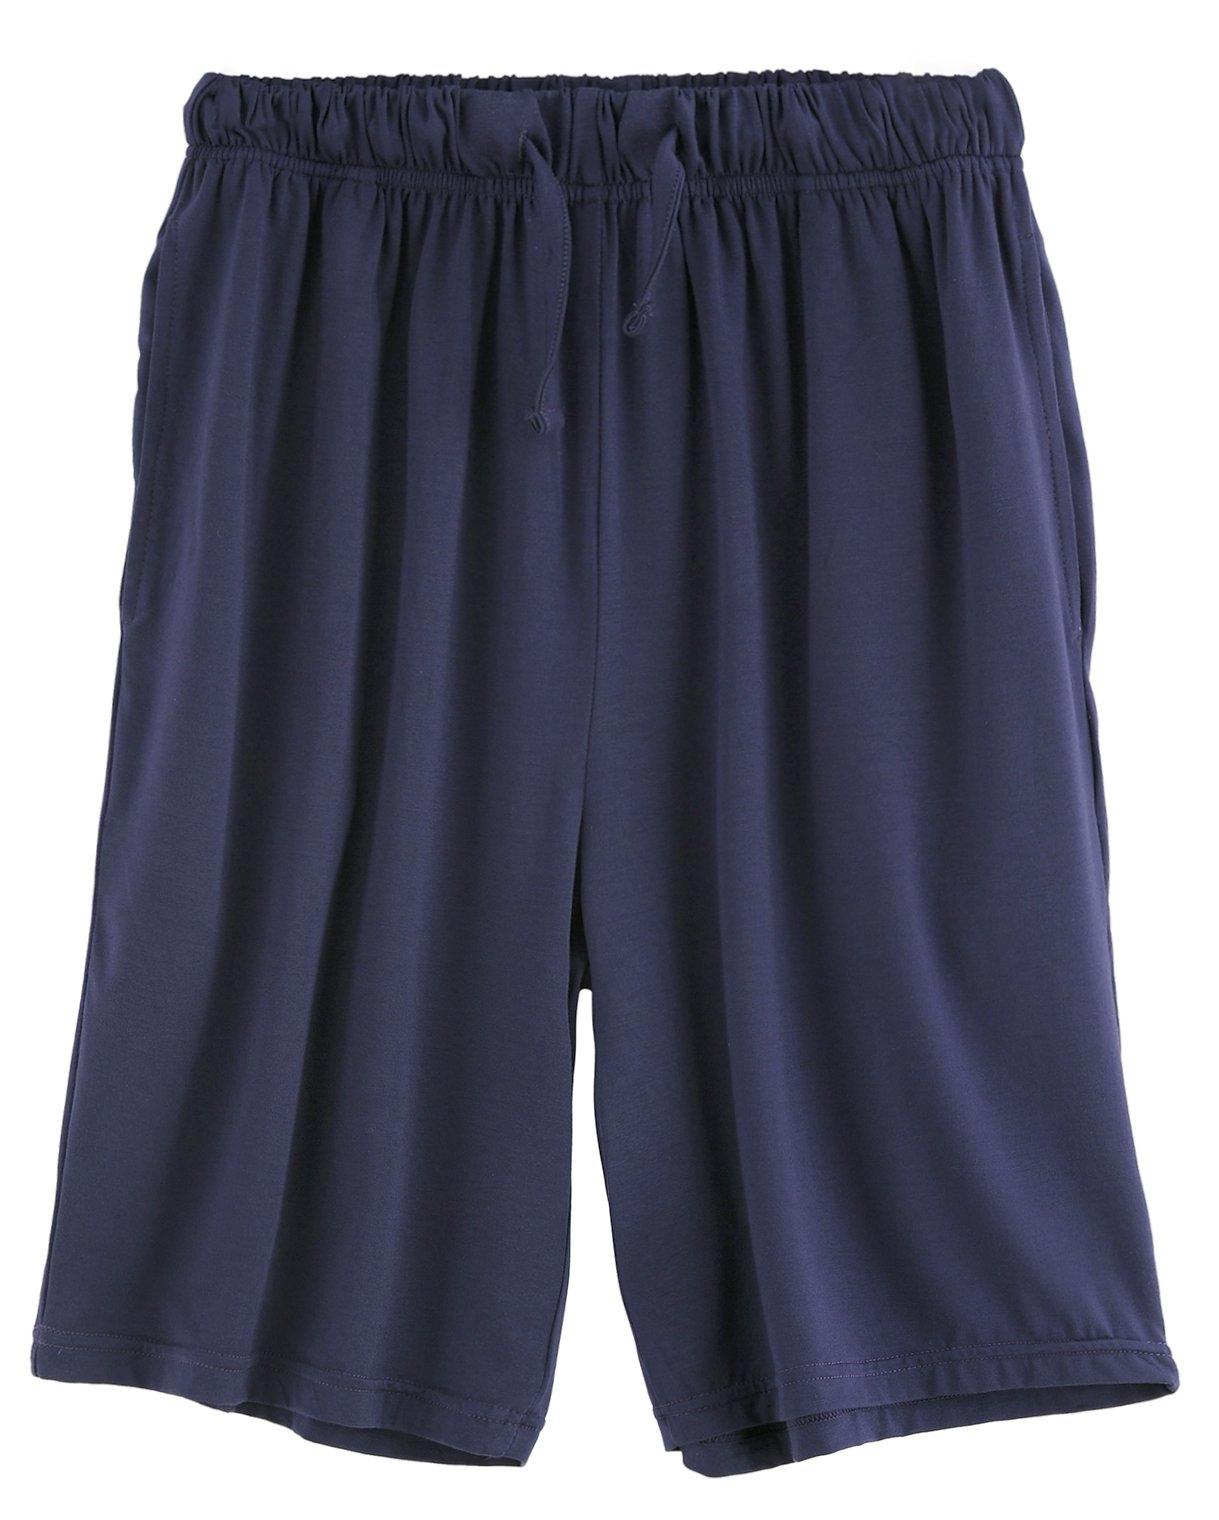 Latuza Men's Sleep Shorts Loose Lounge Shorts XXL Navy